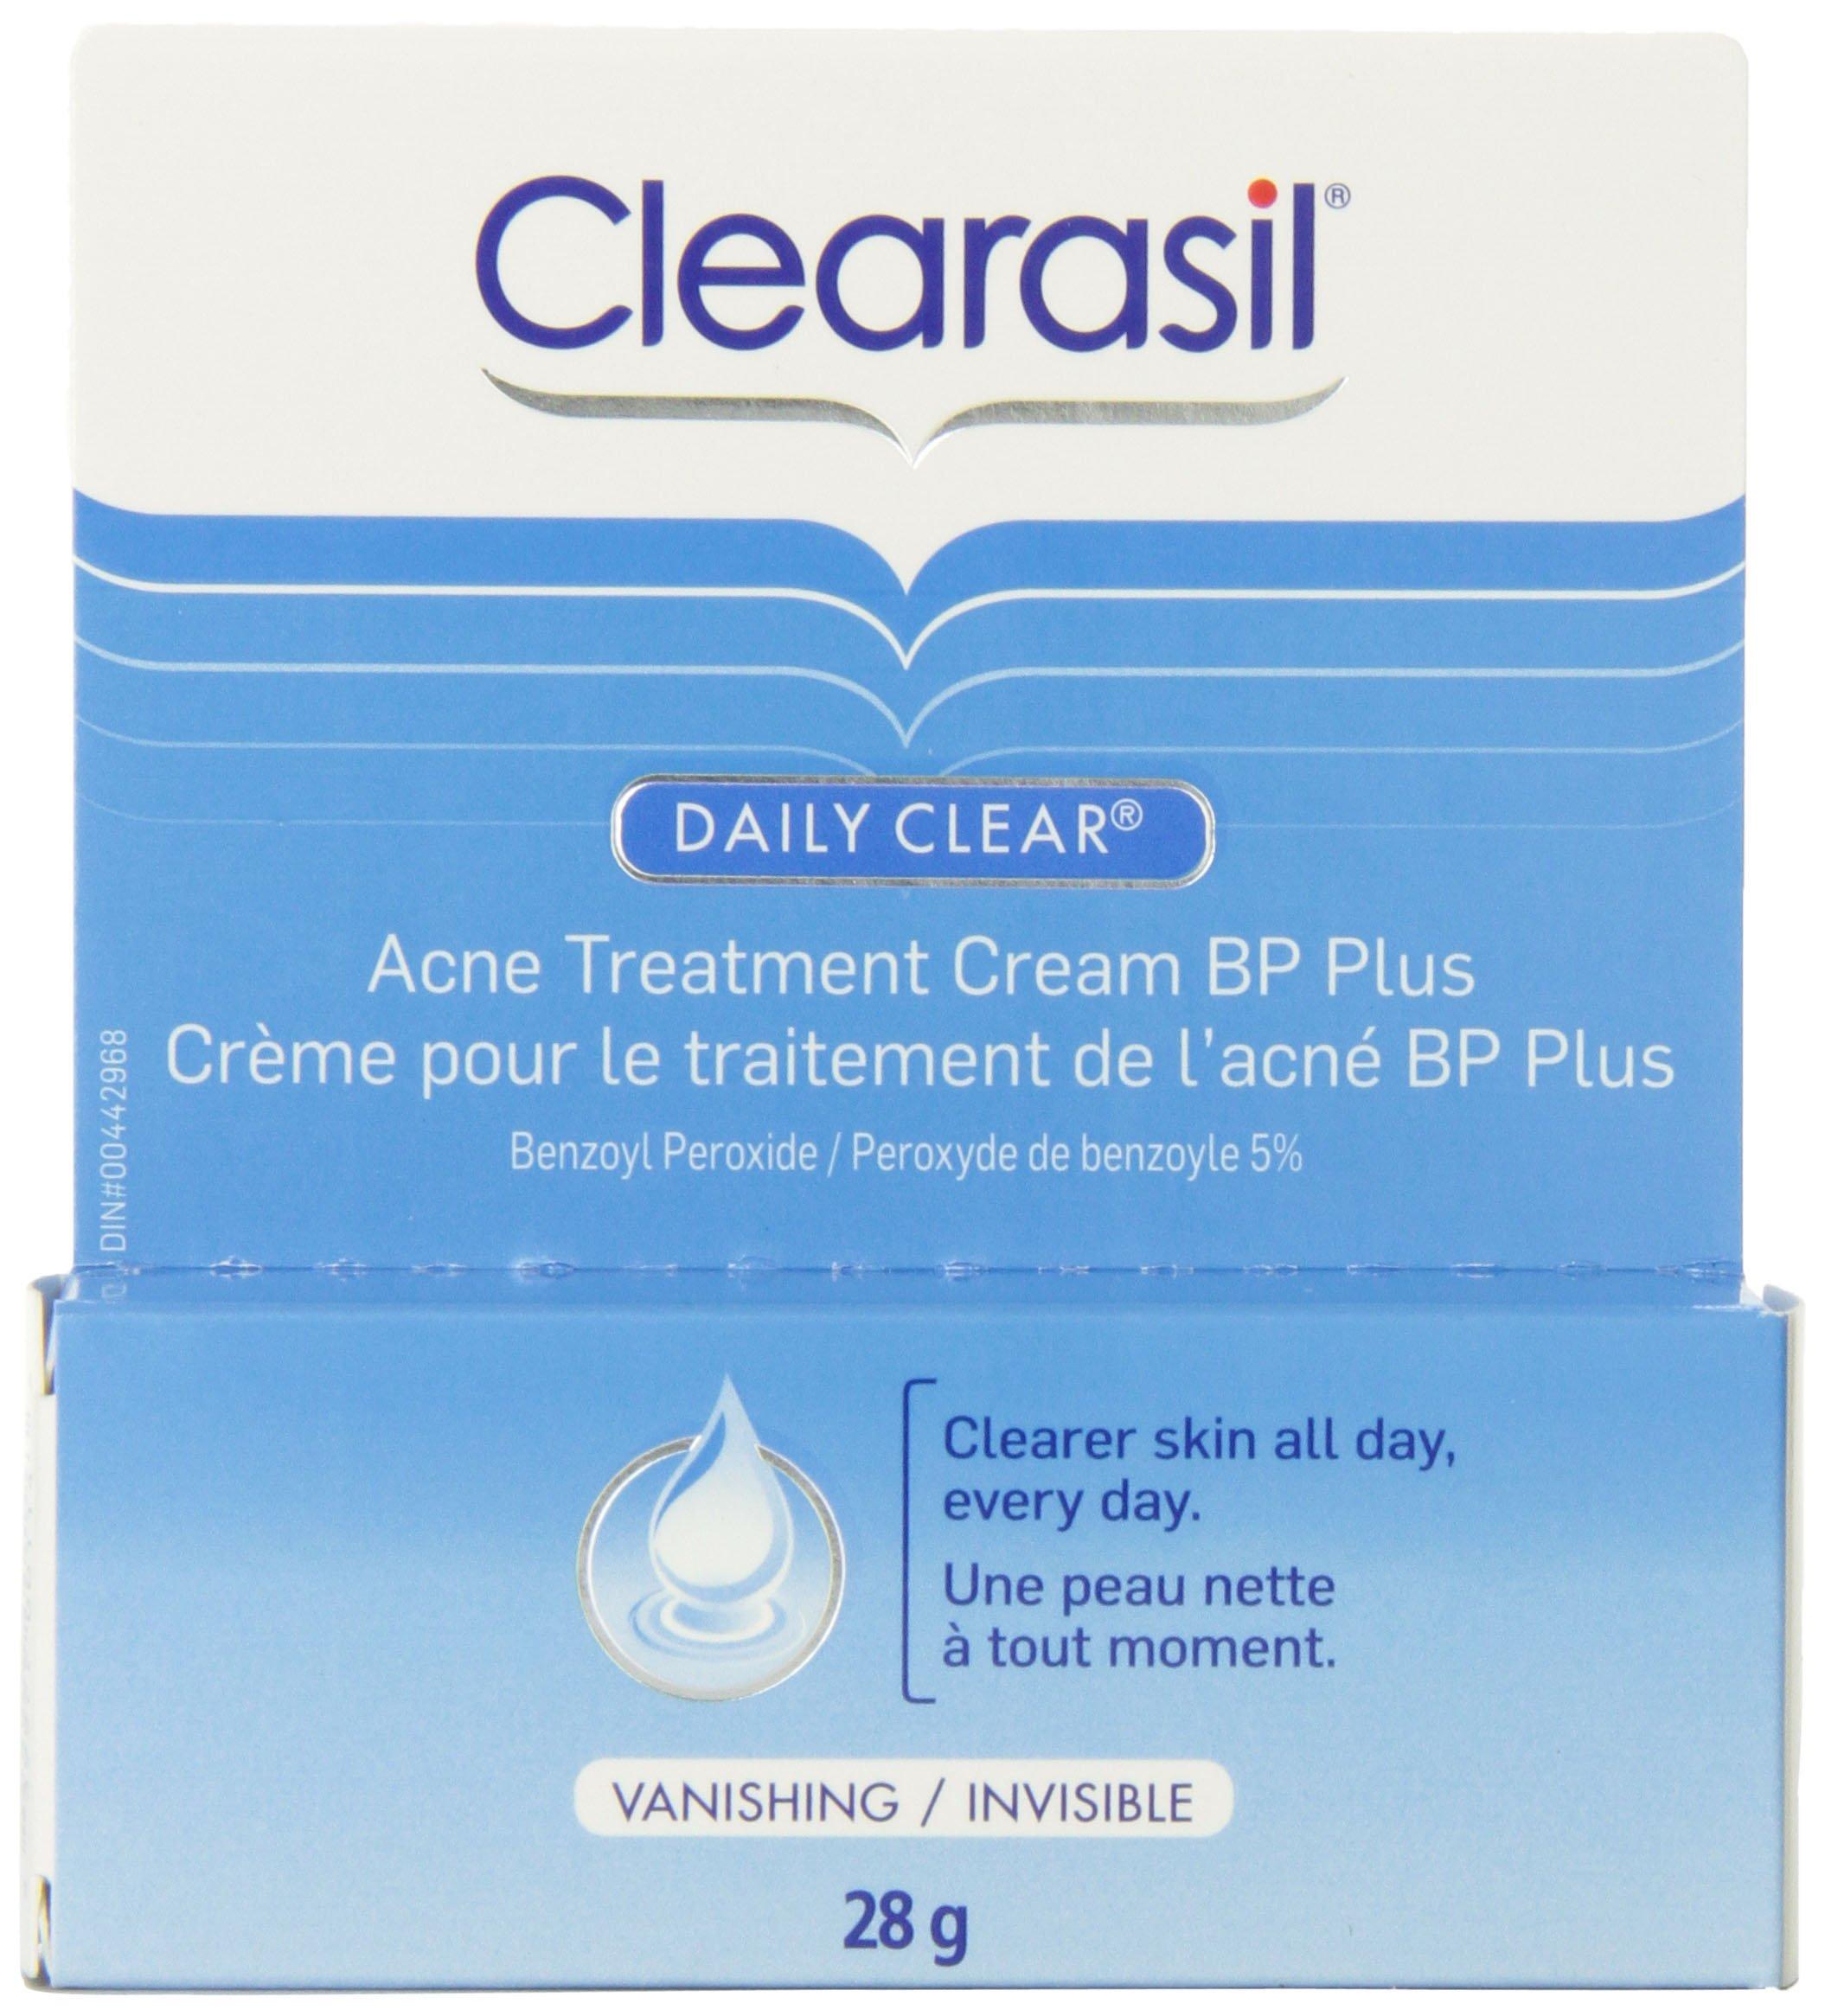 Clearasil Daily Clear BP Plus Acne Treatment Cream, 28g